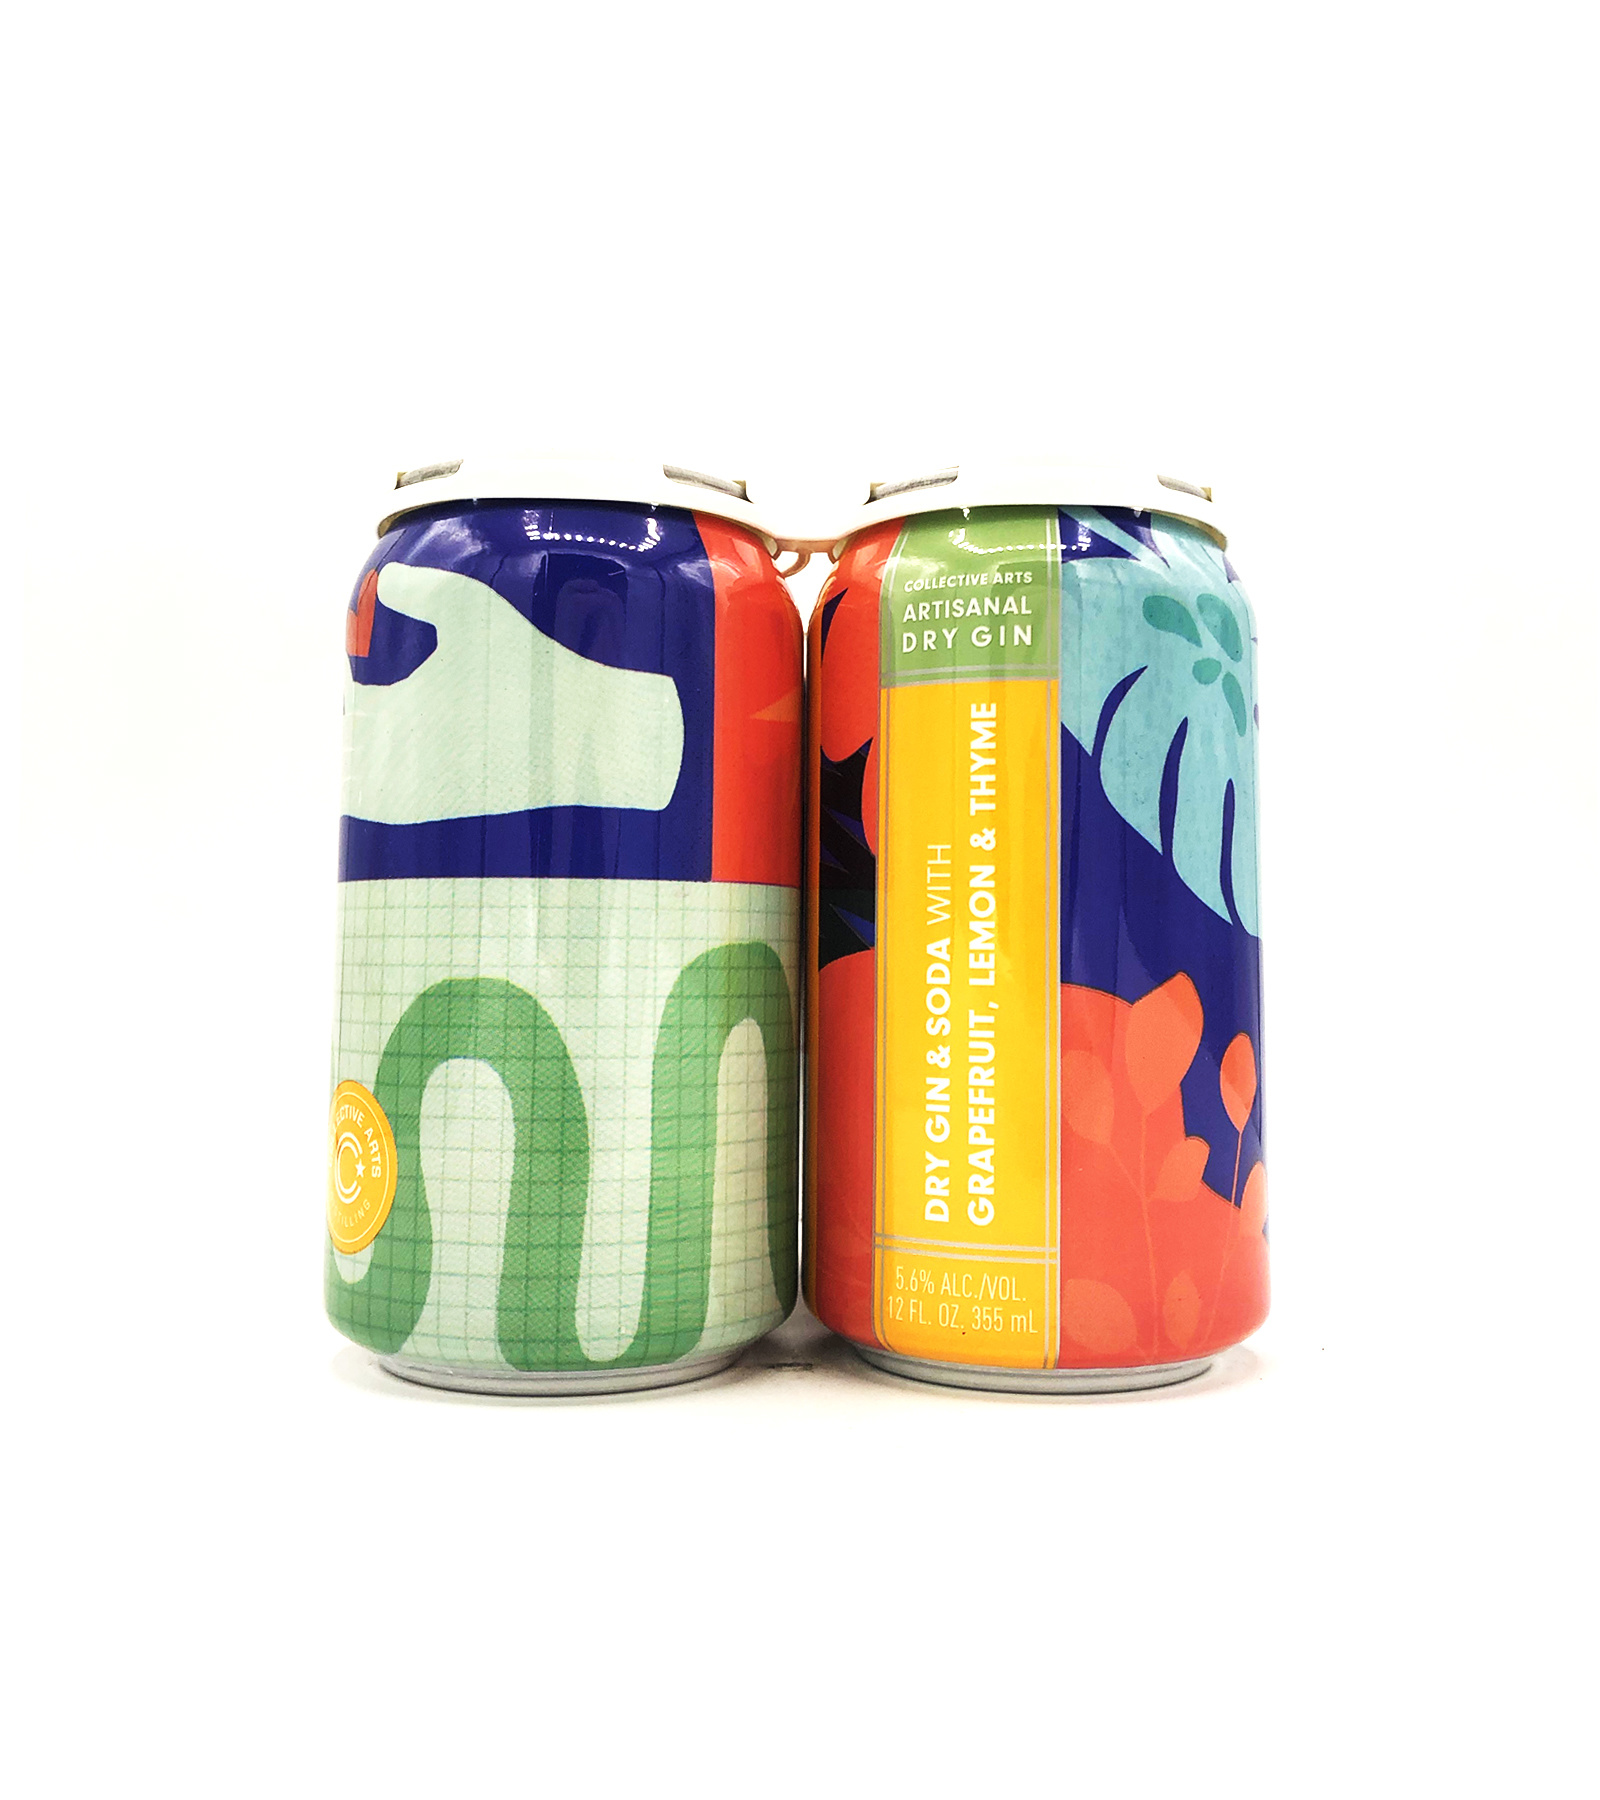 Collective Arts Distilling Dry Gin & Soda Grapefruit Lemon & Thyme 12oz (can)